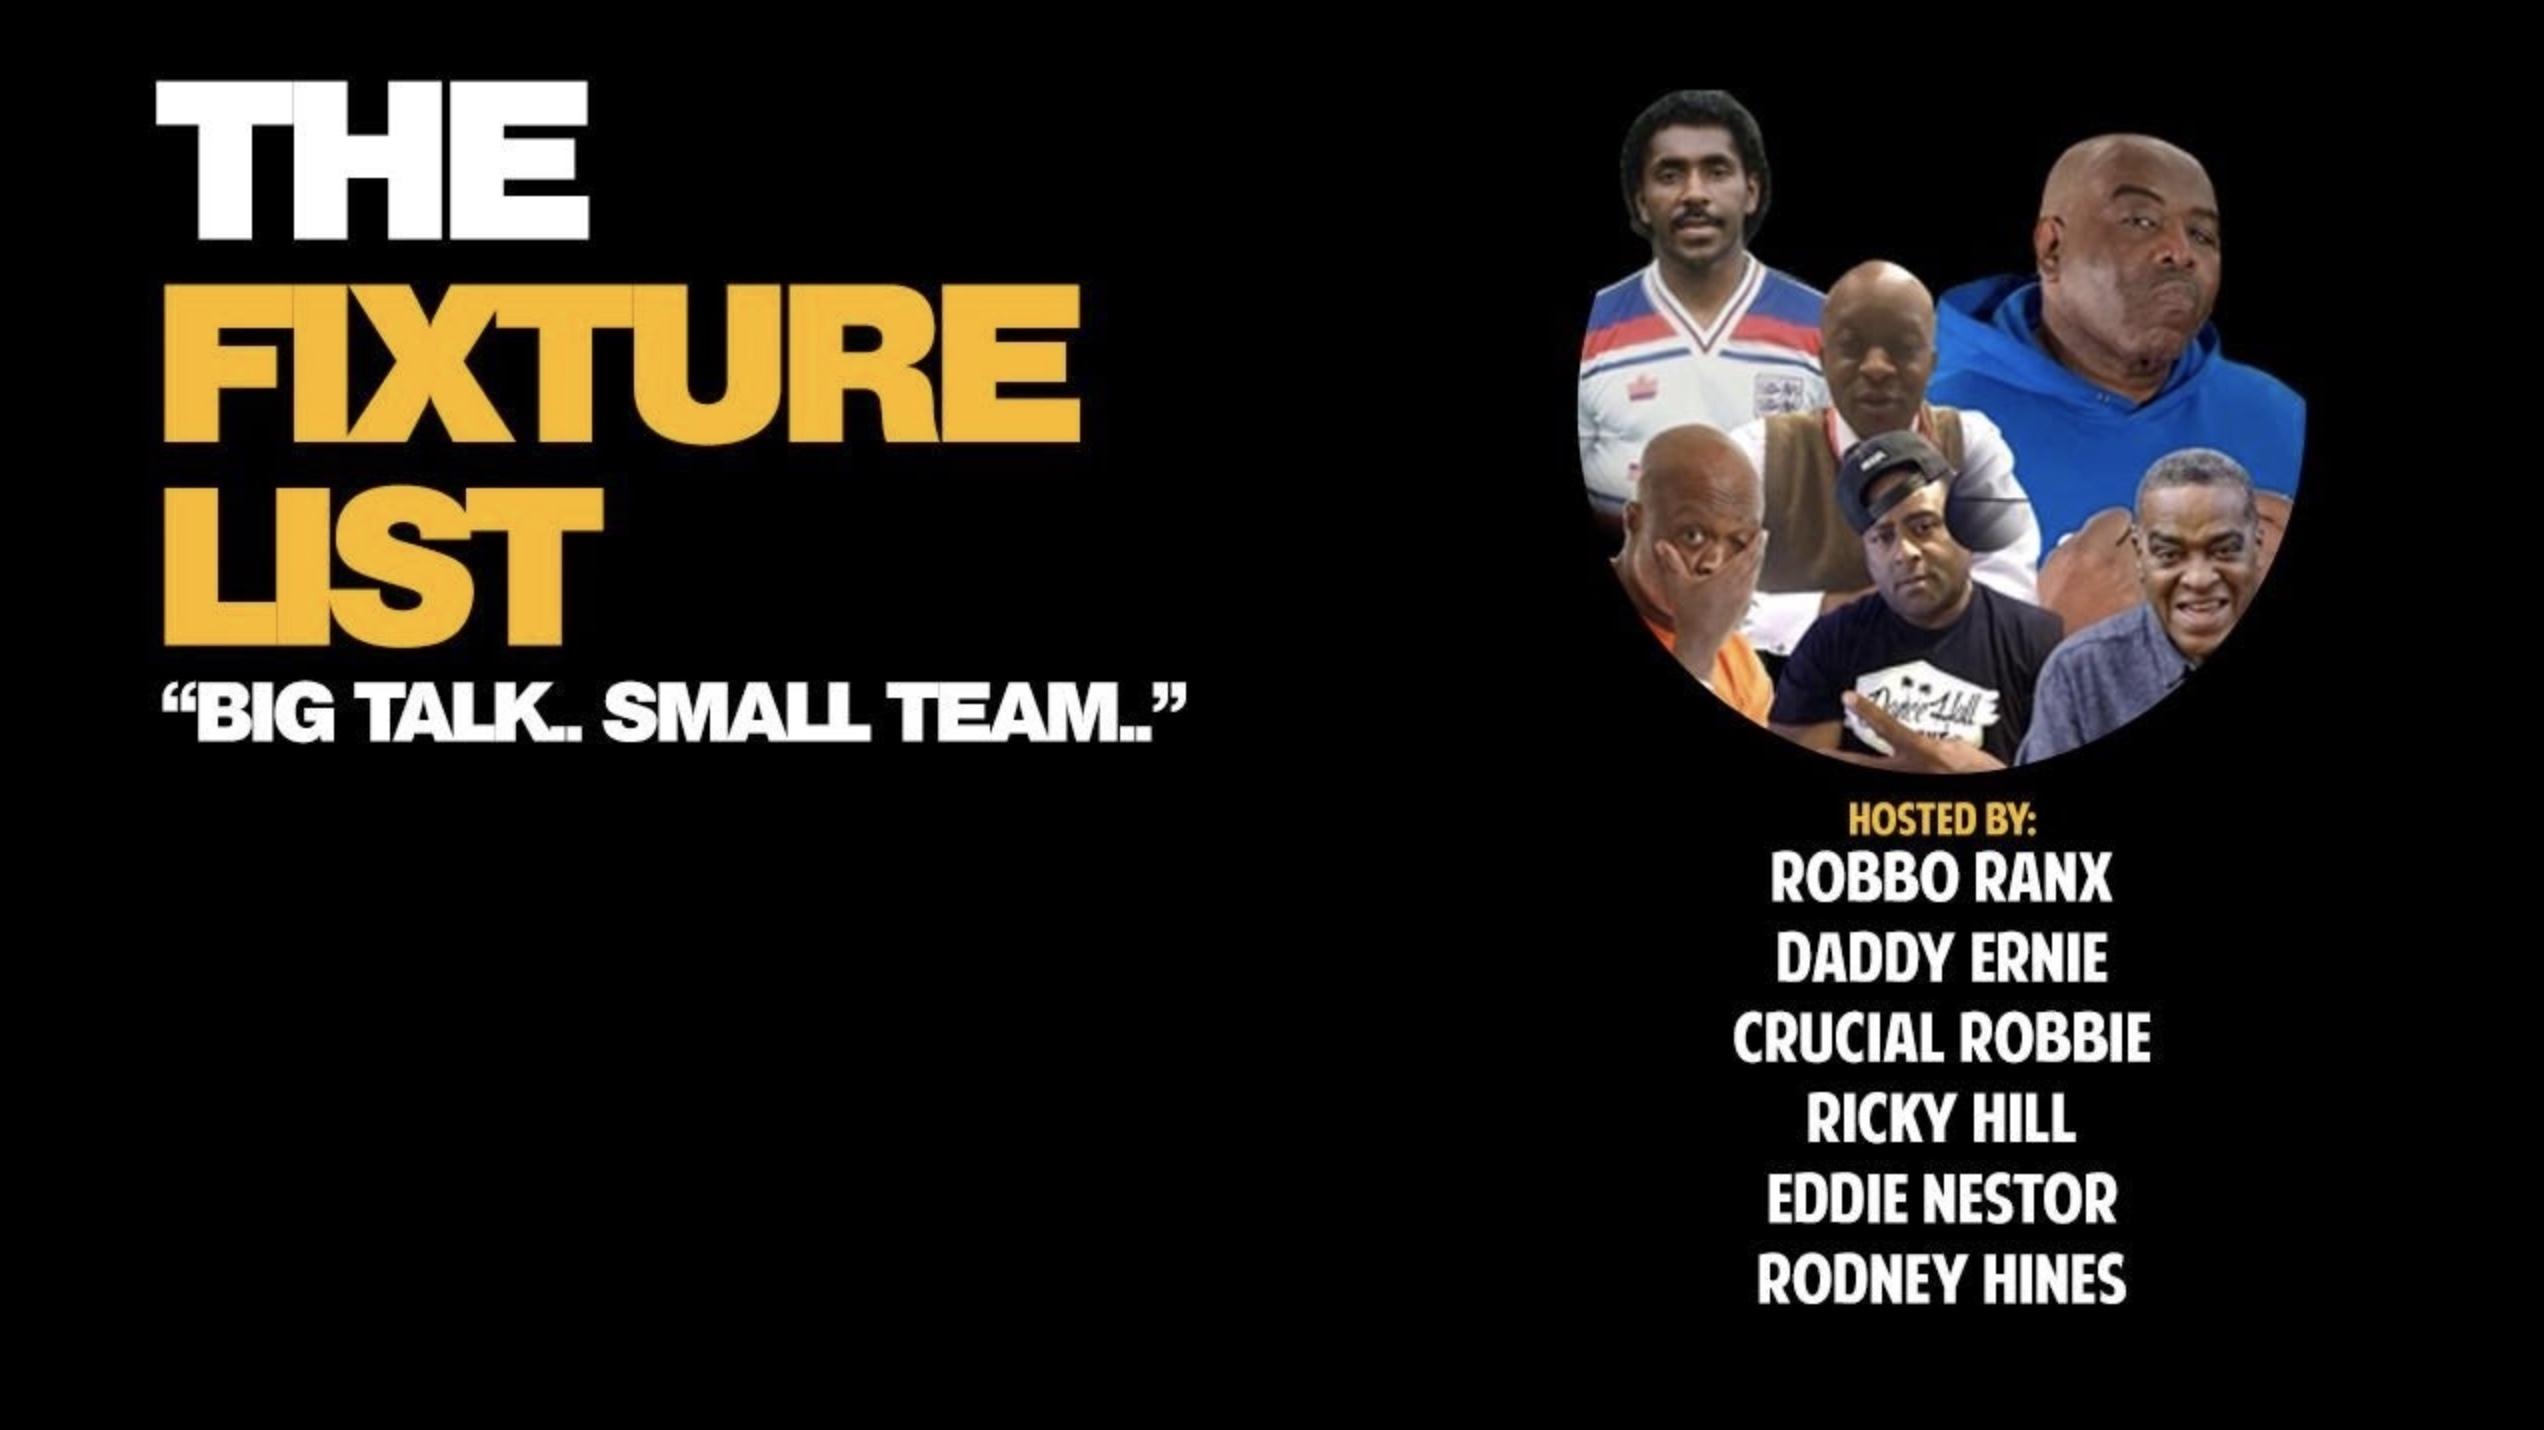 The Fixture List